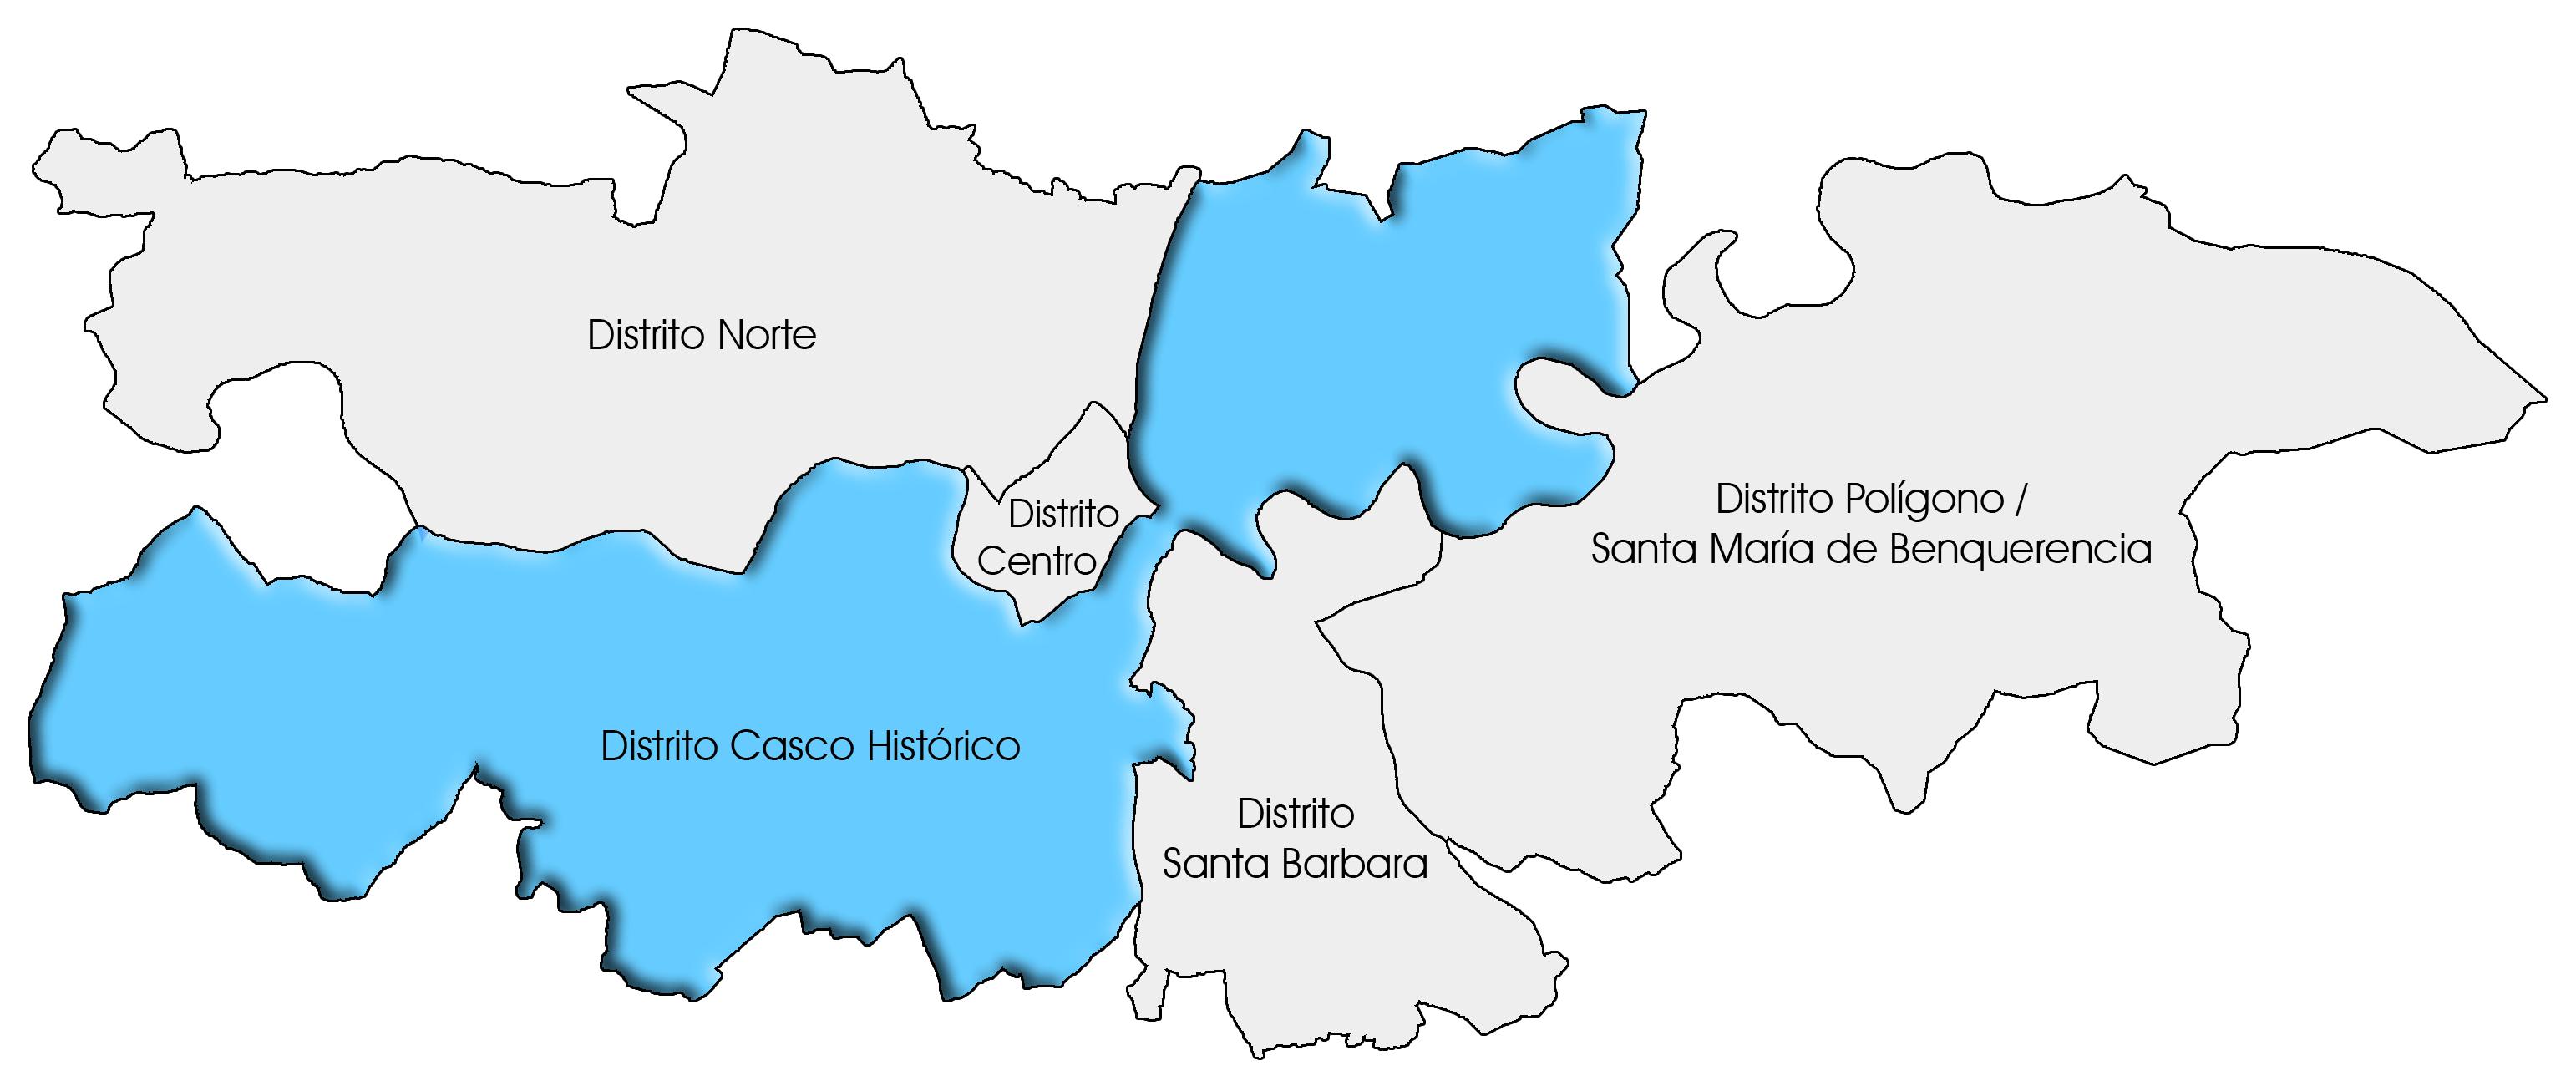 Distrito Casco Histórico